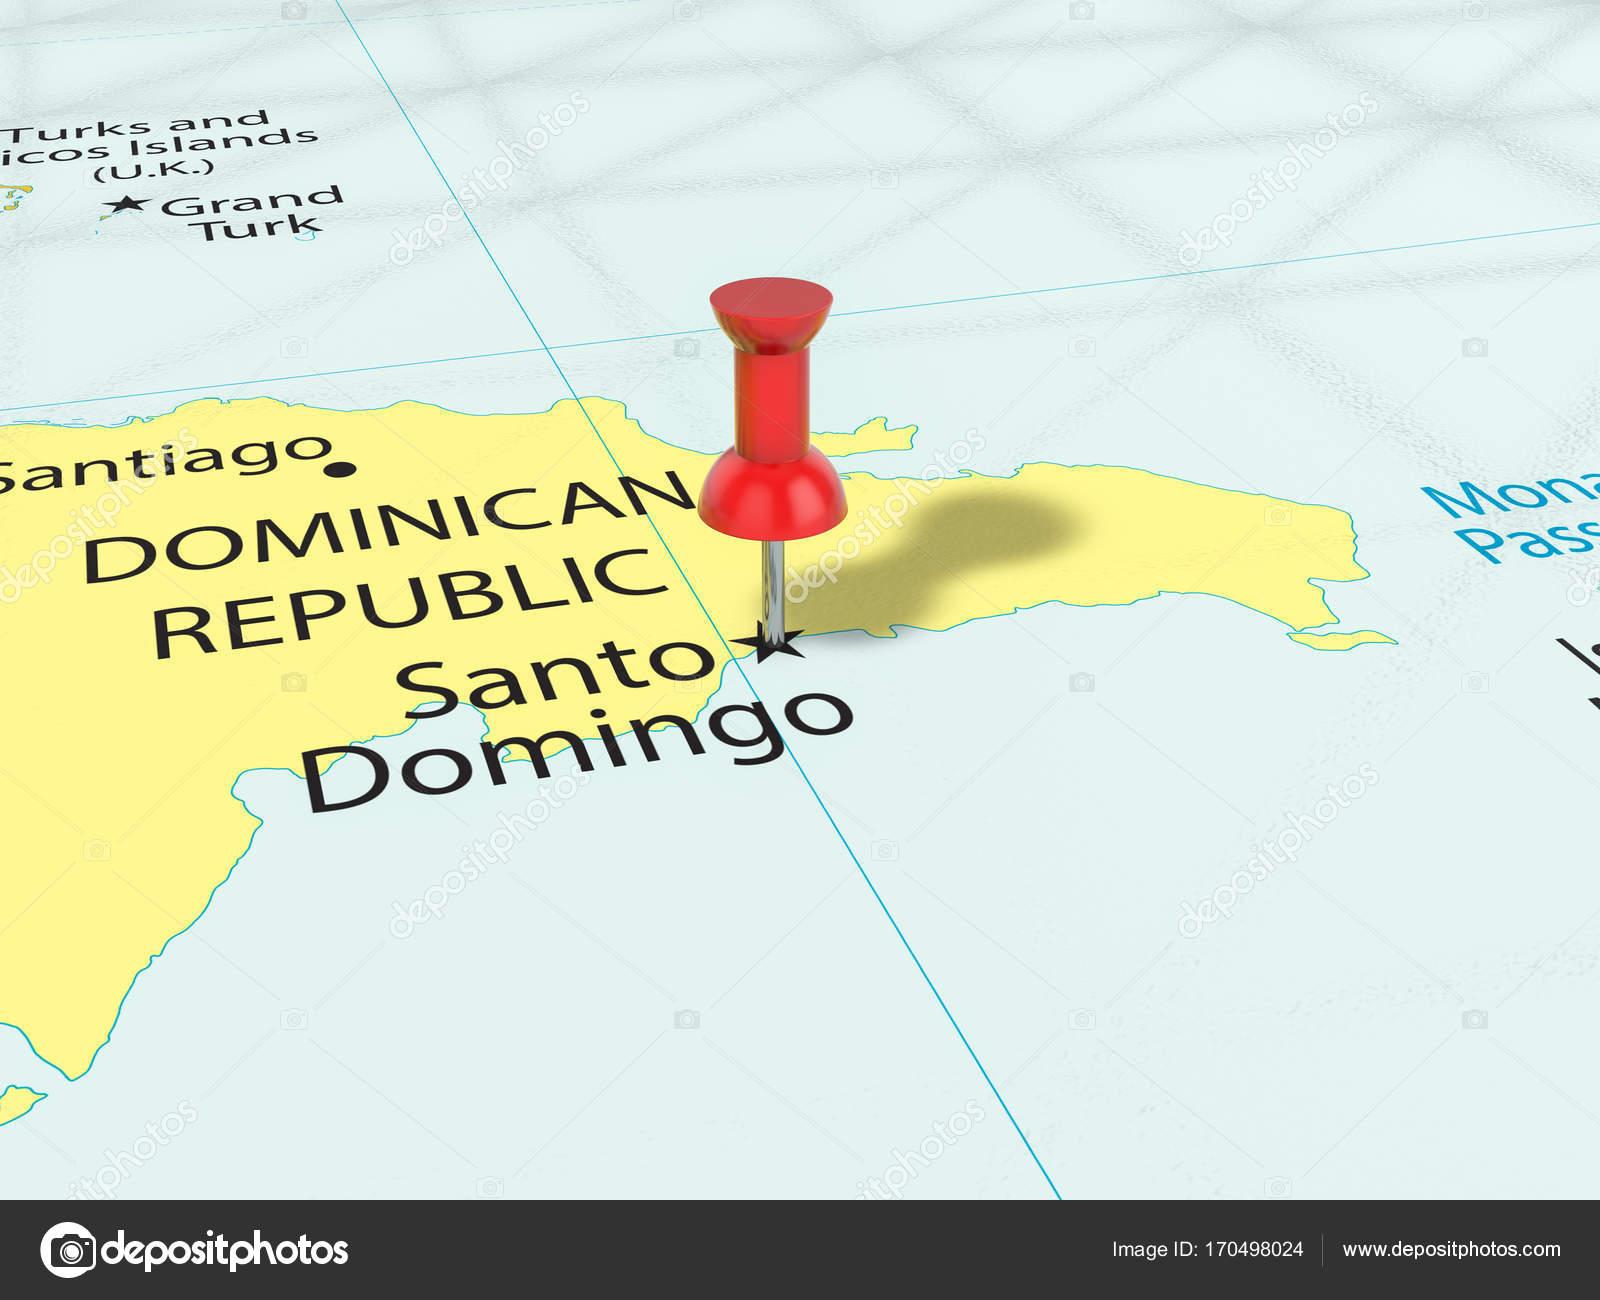 Pushpin on Santo Domingo map — Stock Photo © julydfg #170498024 on veracruz on a map, ambergris caye on a map, bogotá on a map, st. augustine on a map, kiel canal on a map, ciudad de mexico on a map, cancún on a map, windhoek on a map, sao paulo on a map, maputo on a map, bucaramanga on a map, san juan del sur on a map, mar del plata on a map, majuro on a map, san paulo on a map, calbuco on a map, hermosillo on a map, havana on a map, san pedro sula on a map, salta on a map,